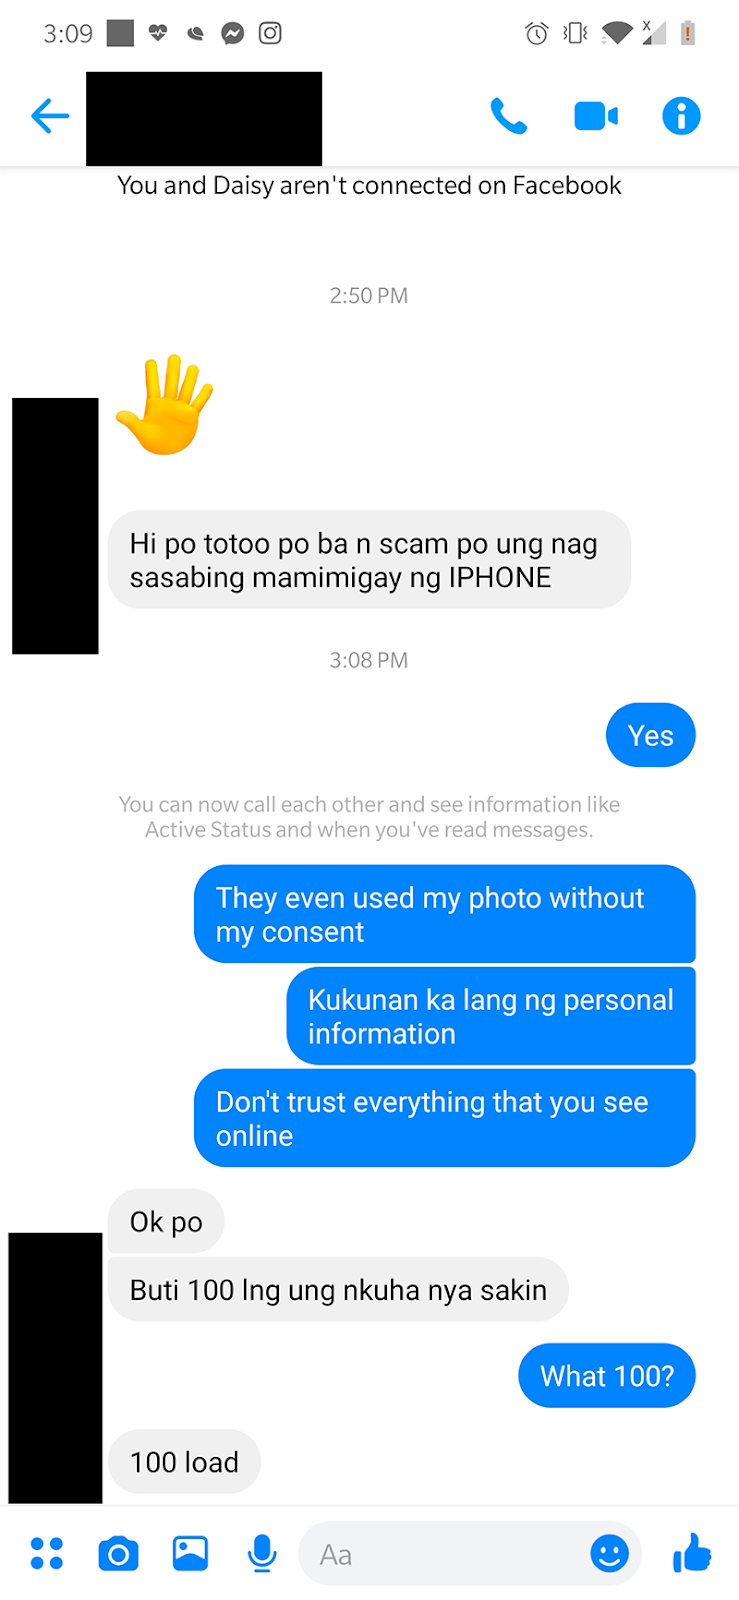 A Facebook user we interviewed who got scammed